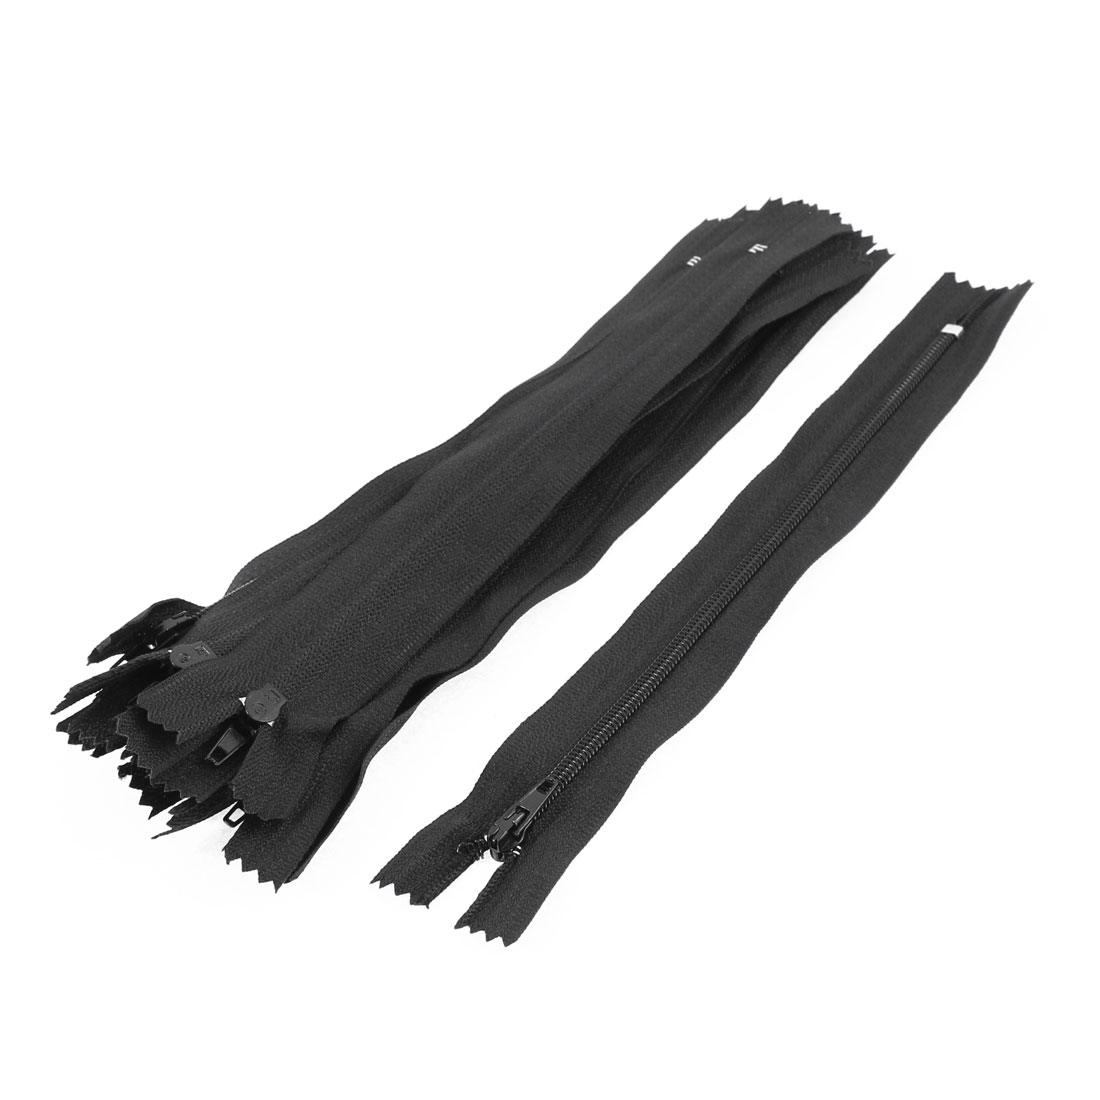 Dress Pants Closed End Nylon Zippers Tailor Sewing Craft Tool Black 18cm 10 Pcs